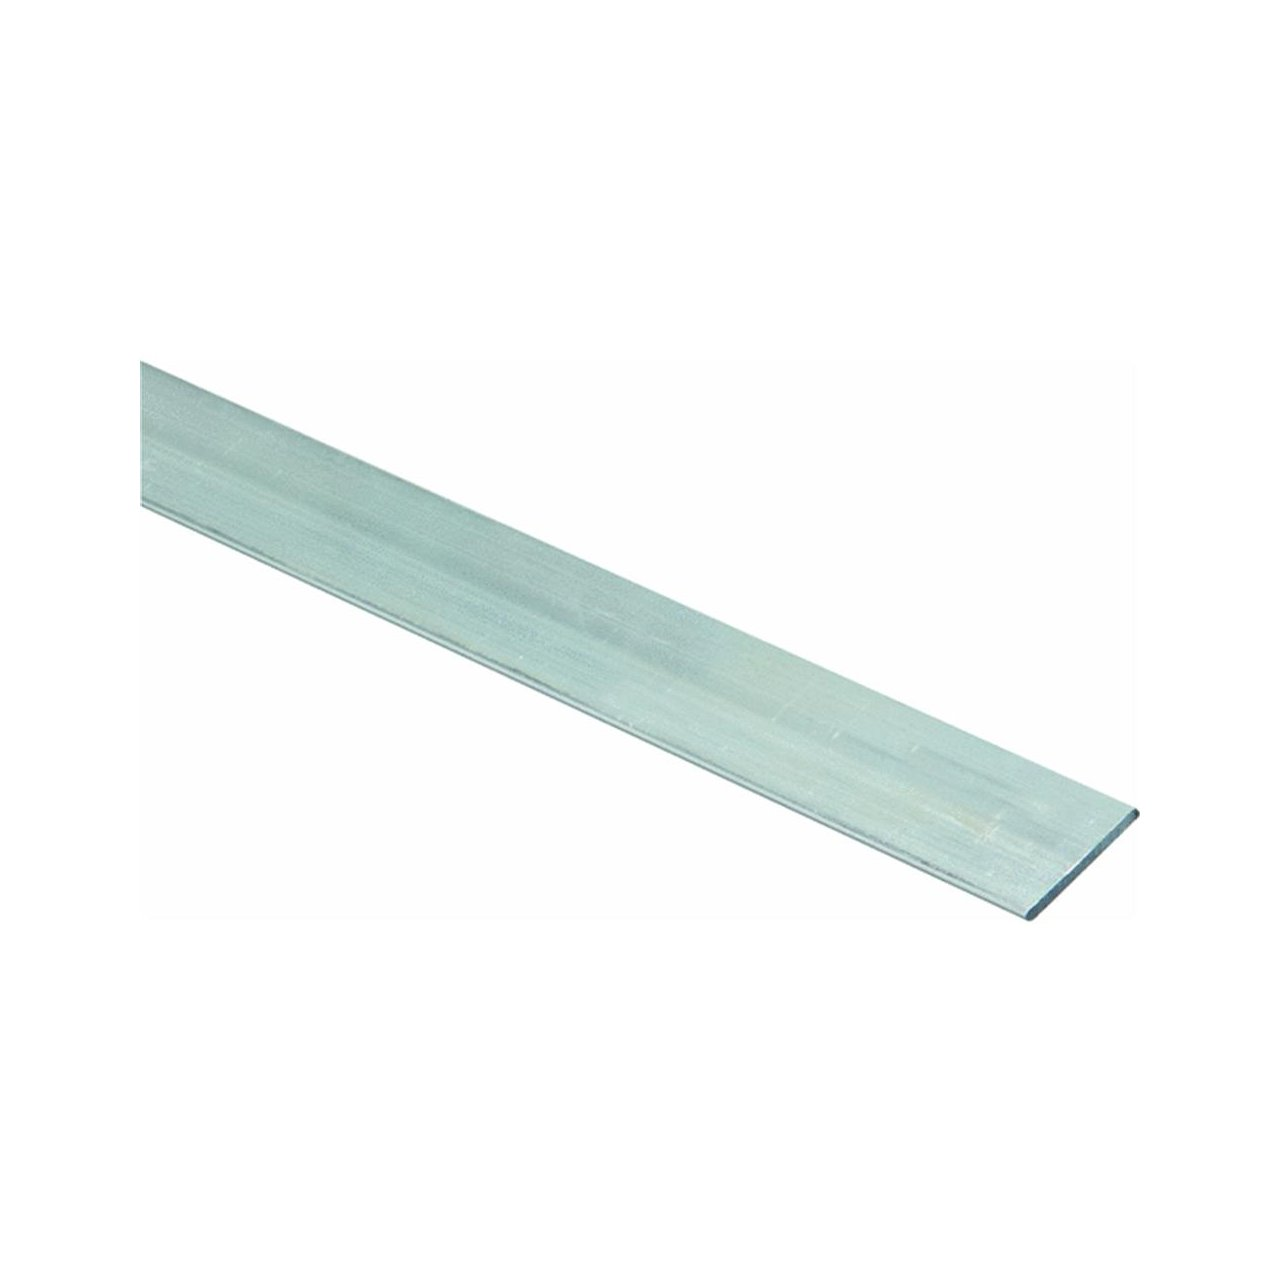 National Mfg. N247197 Construct-it Aluminum Bar [Misc.] [Misc.]